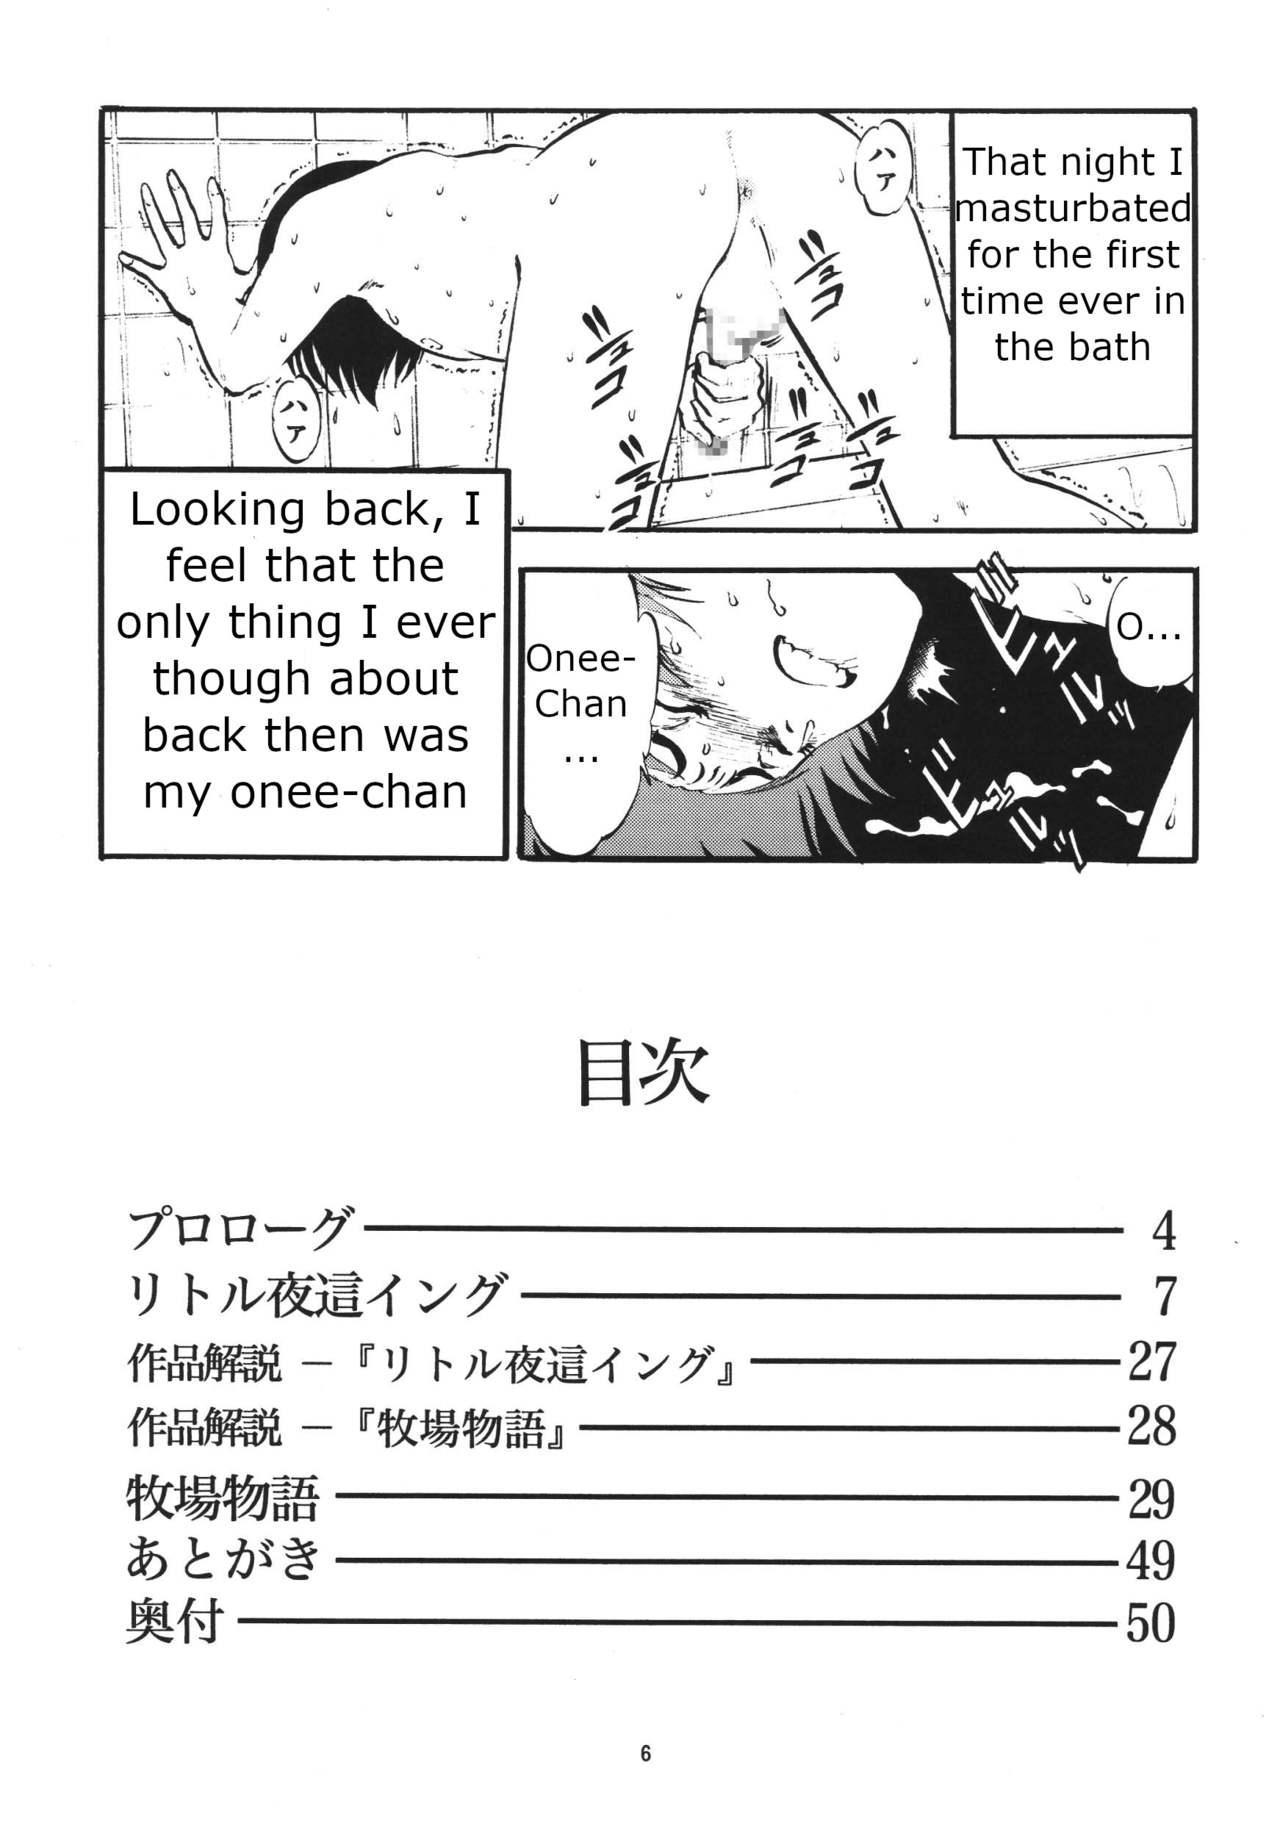 [RPG Company 2 (Yoriu Mushi)] R-Shitei Play 1 - Little Night Crawling [English] 4